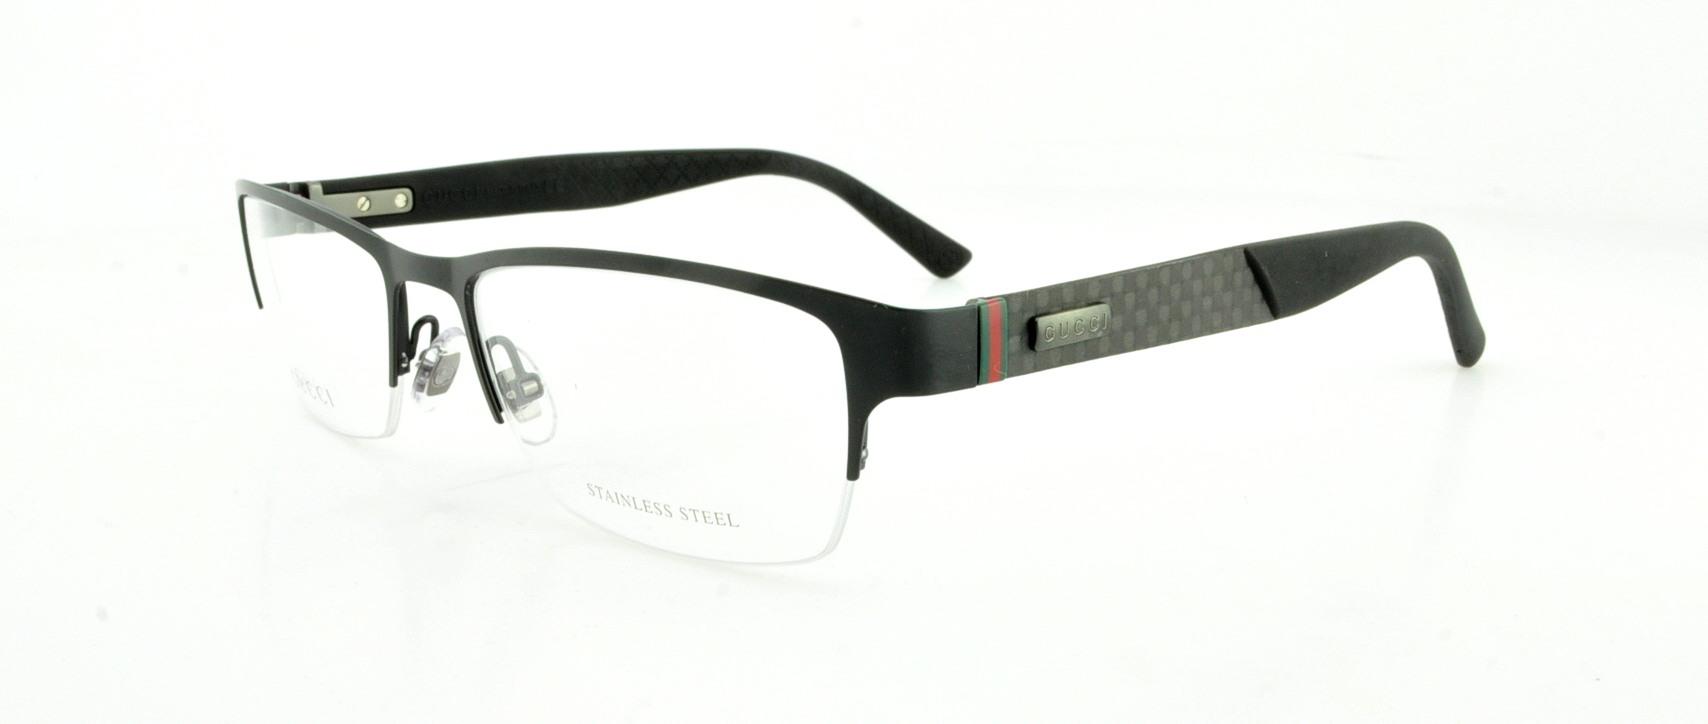 Perfect Gucci Mens Eyeglass Frames Images - Framed Art Ideas ...